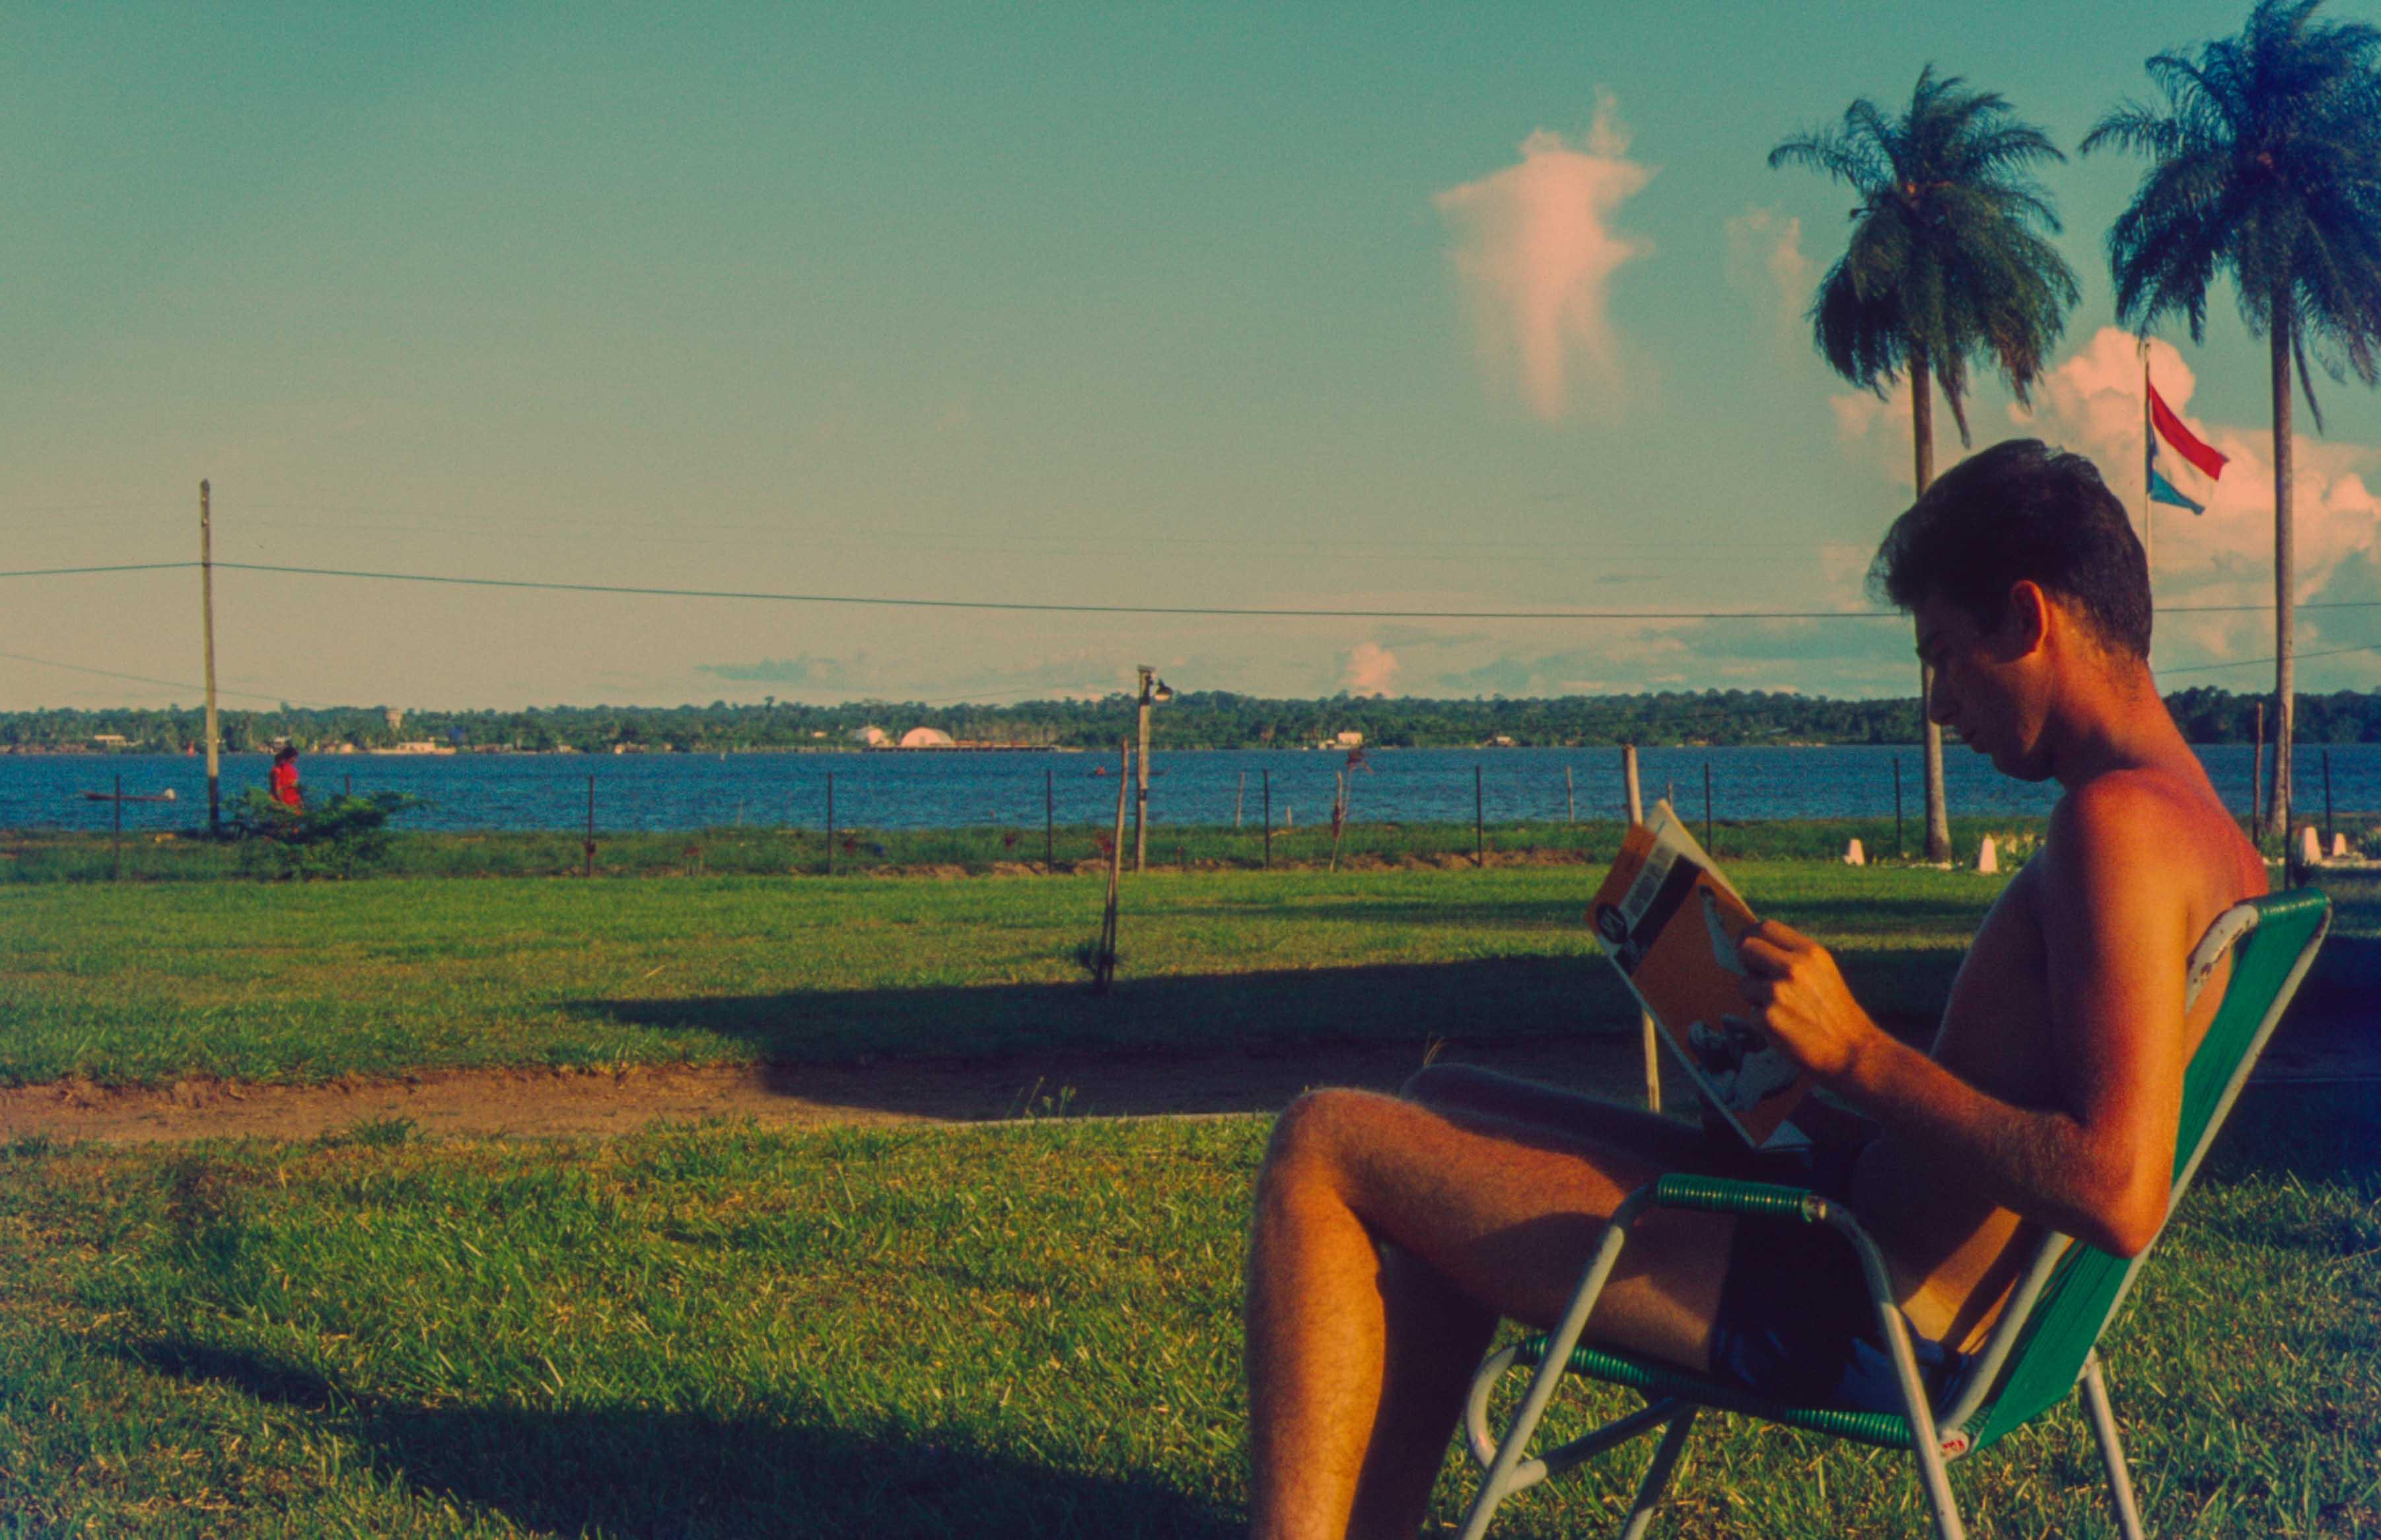 409. Suriname